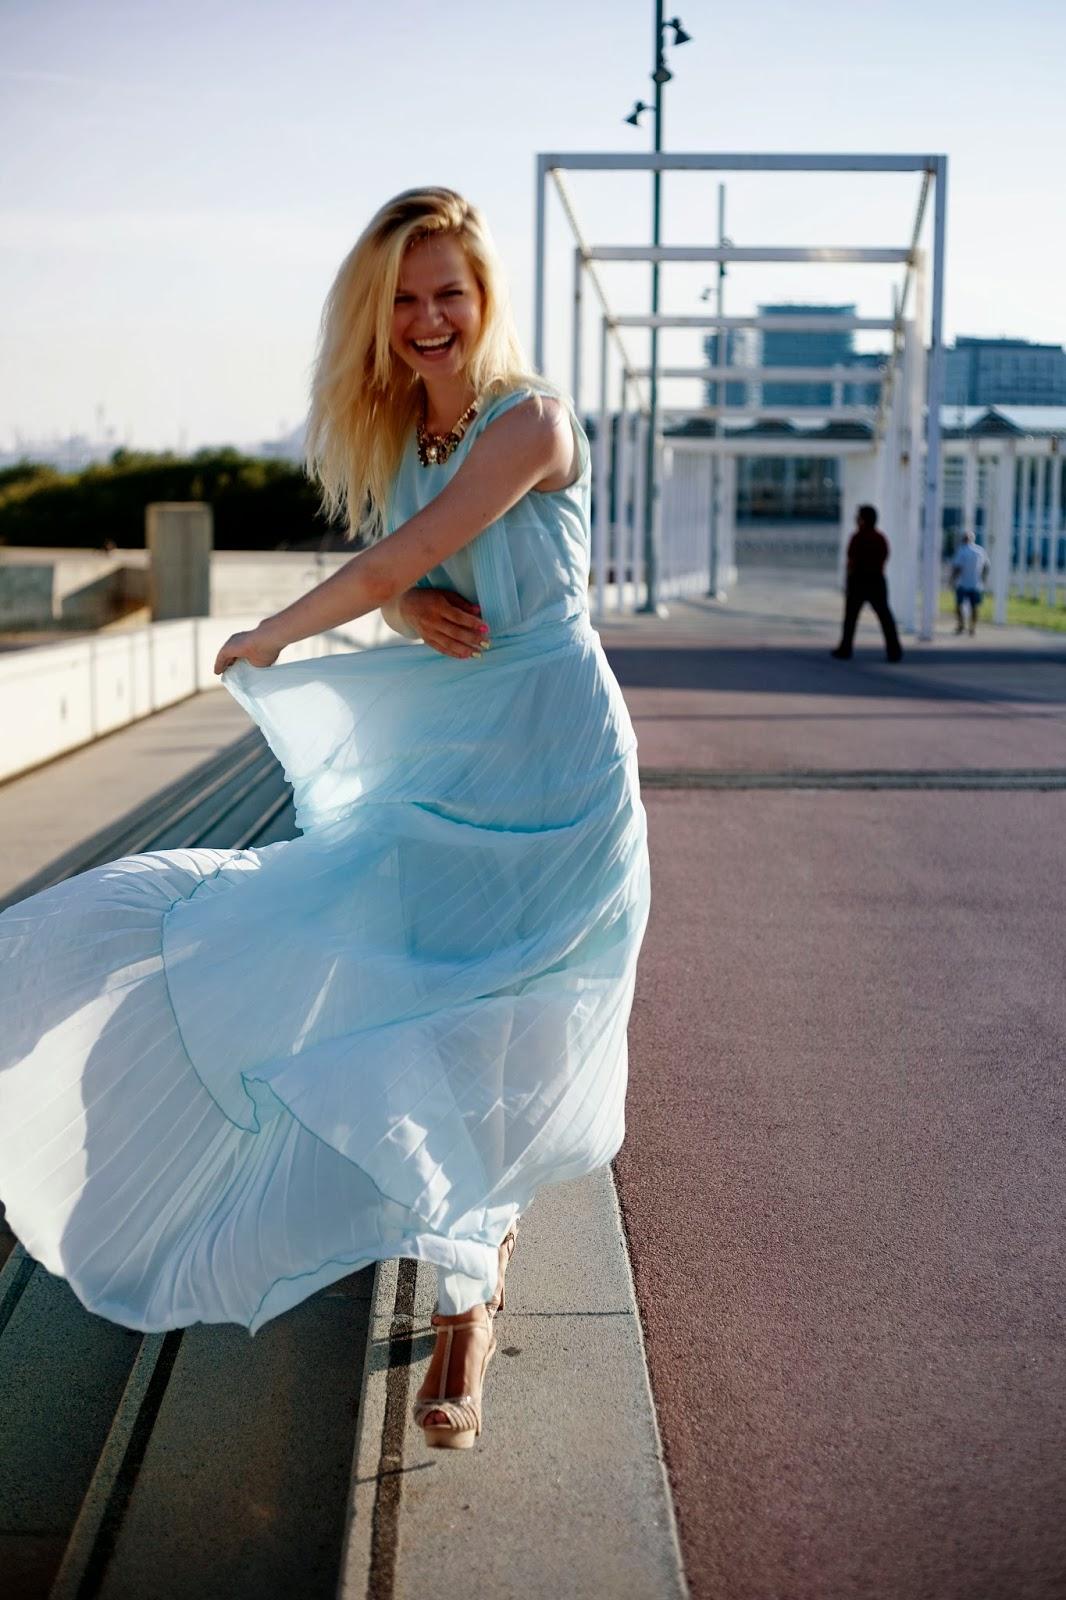 Блоггер,лучший блоггер,Барселона,Ирина Павлова